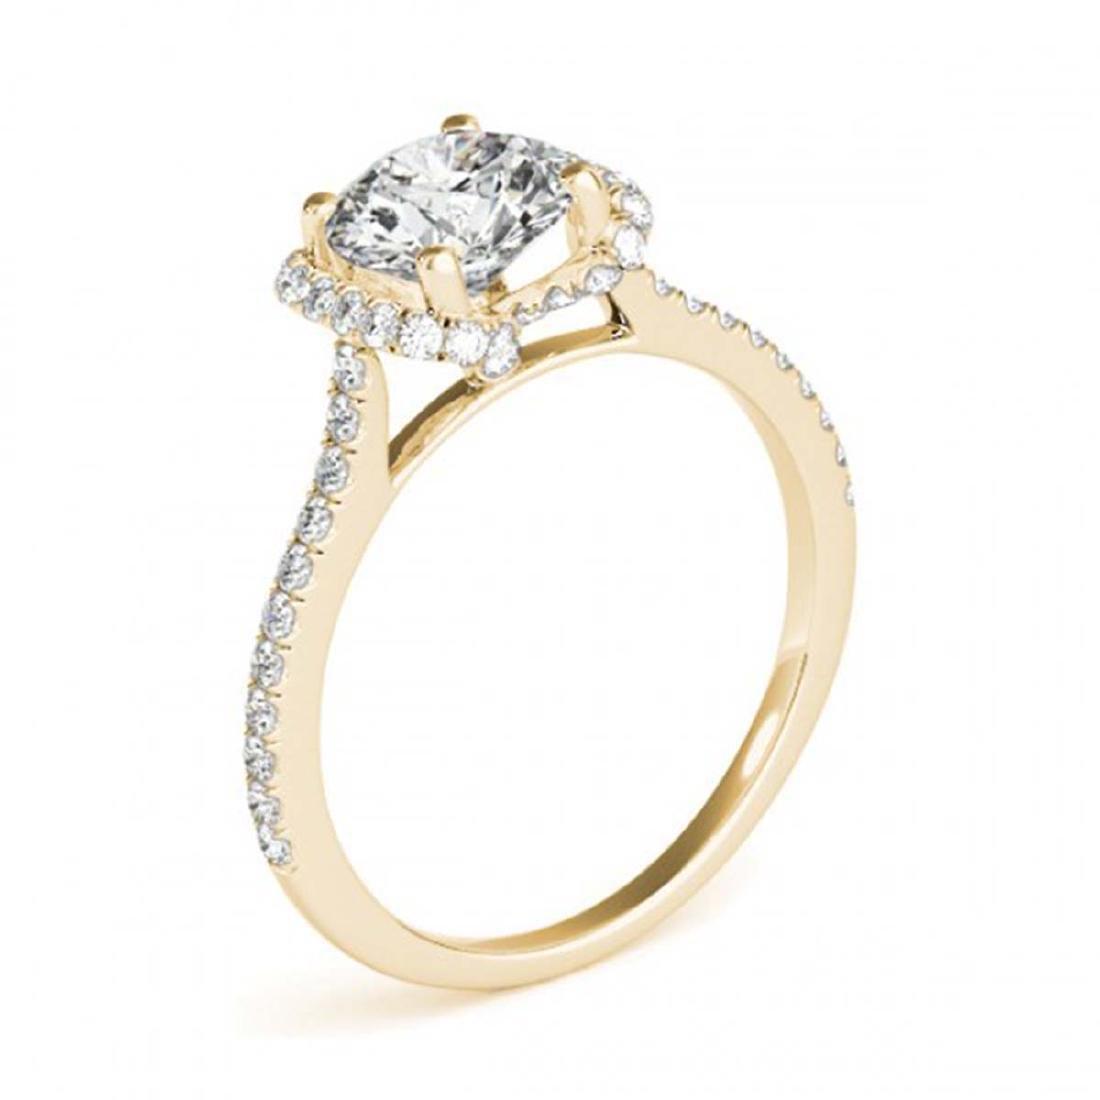 1.33 ctw VS/SI Diamond Halo Ring 18K Yellow Gold - - 3